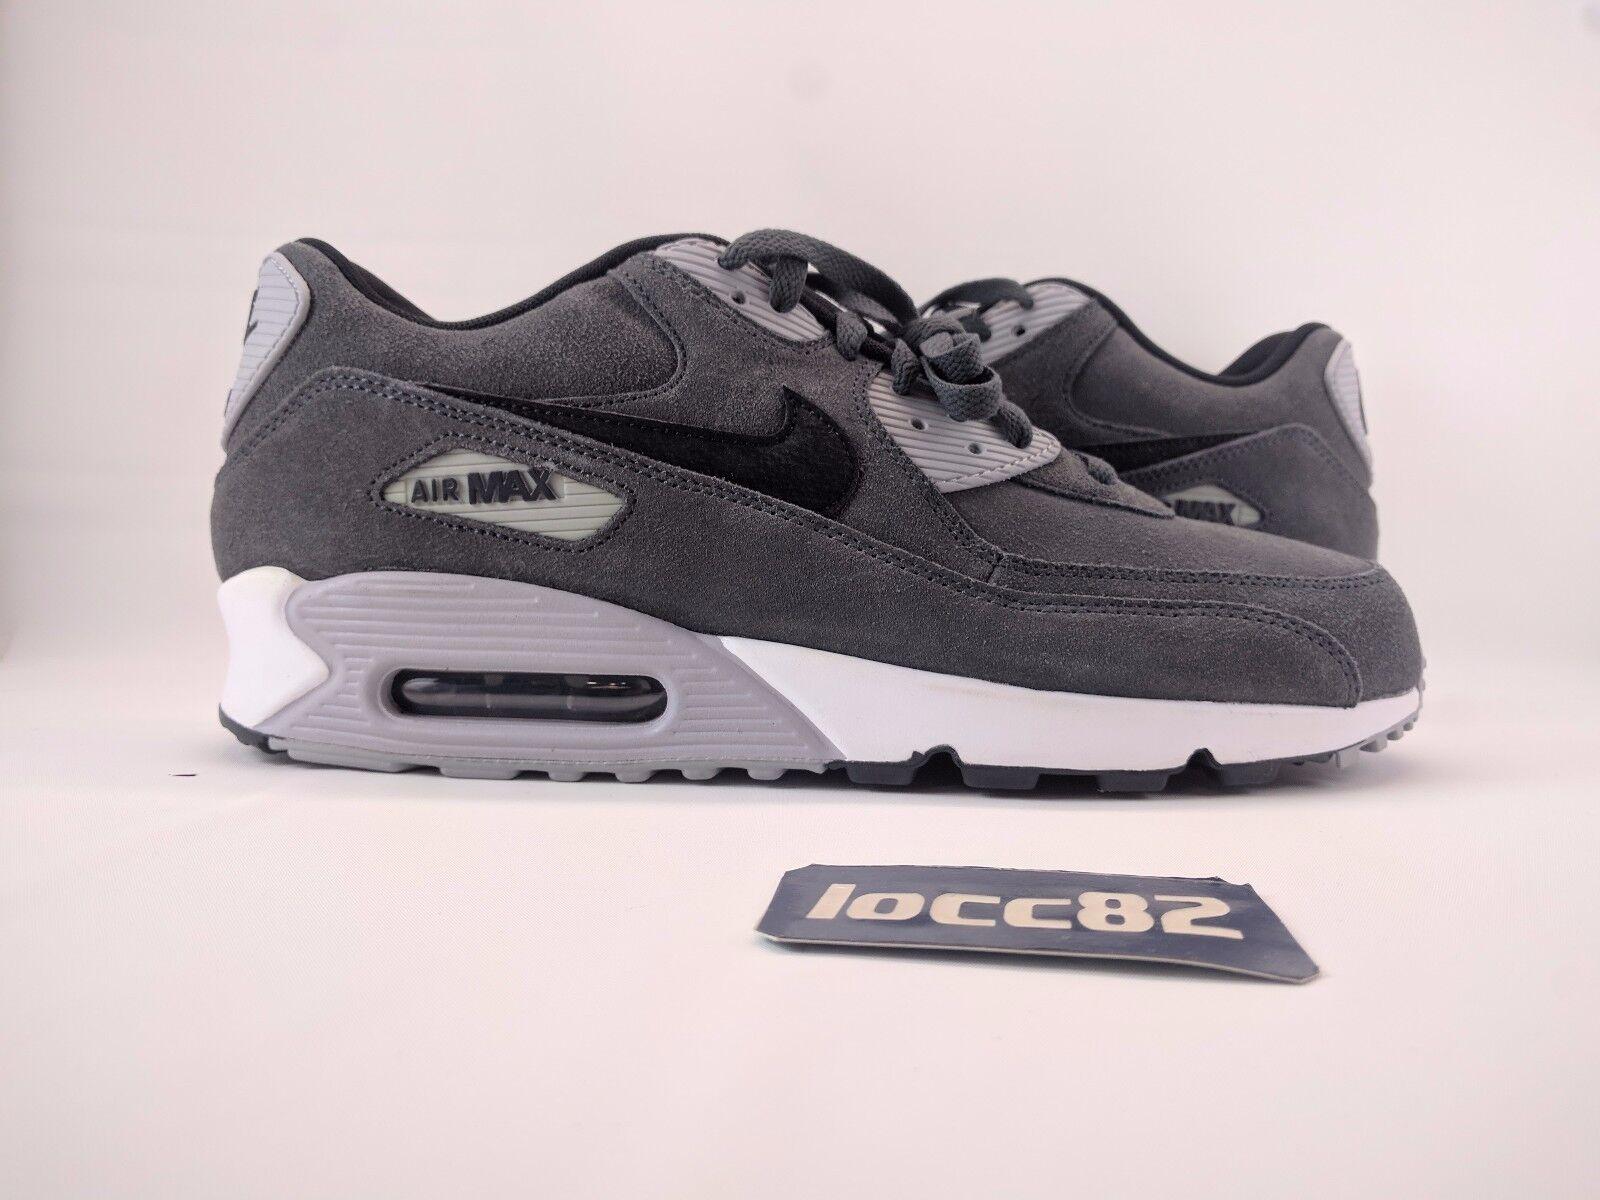 Nike Men's Air Max 90 Running shoes 11.5 [652980 012] am1 am90 am97 zero